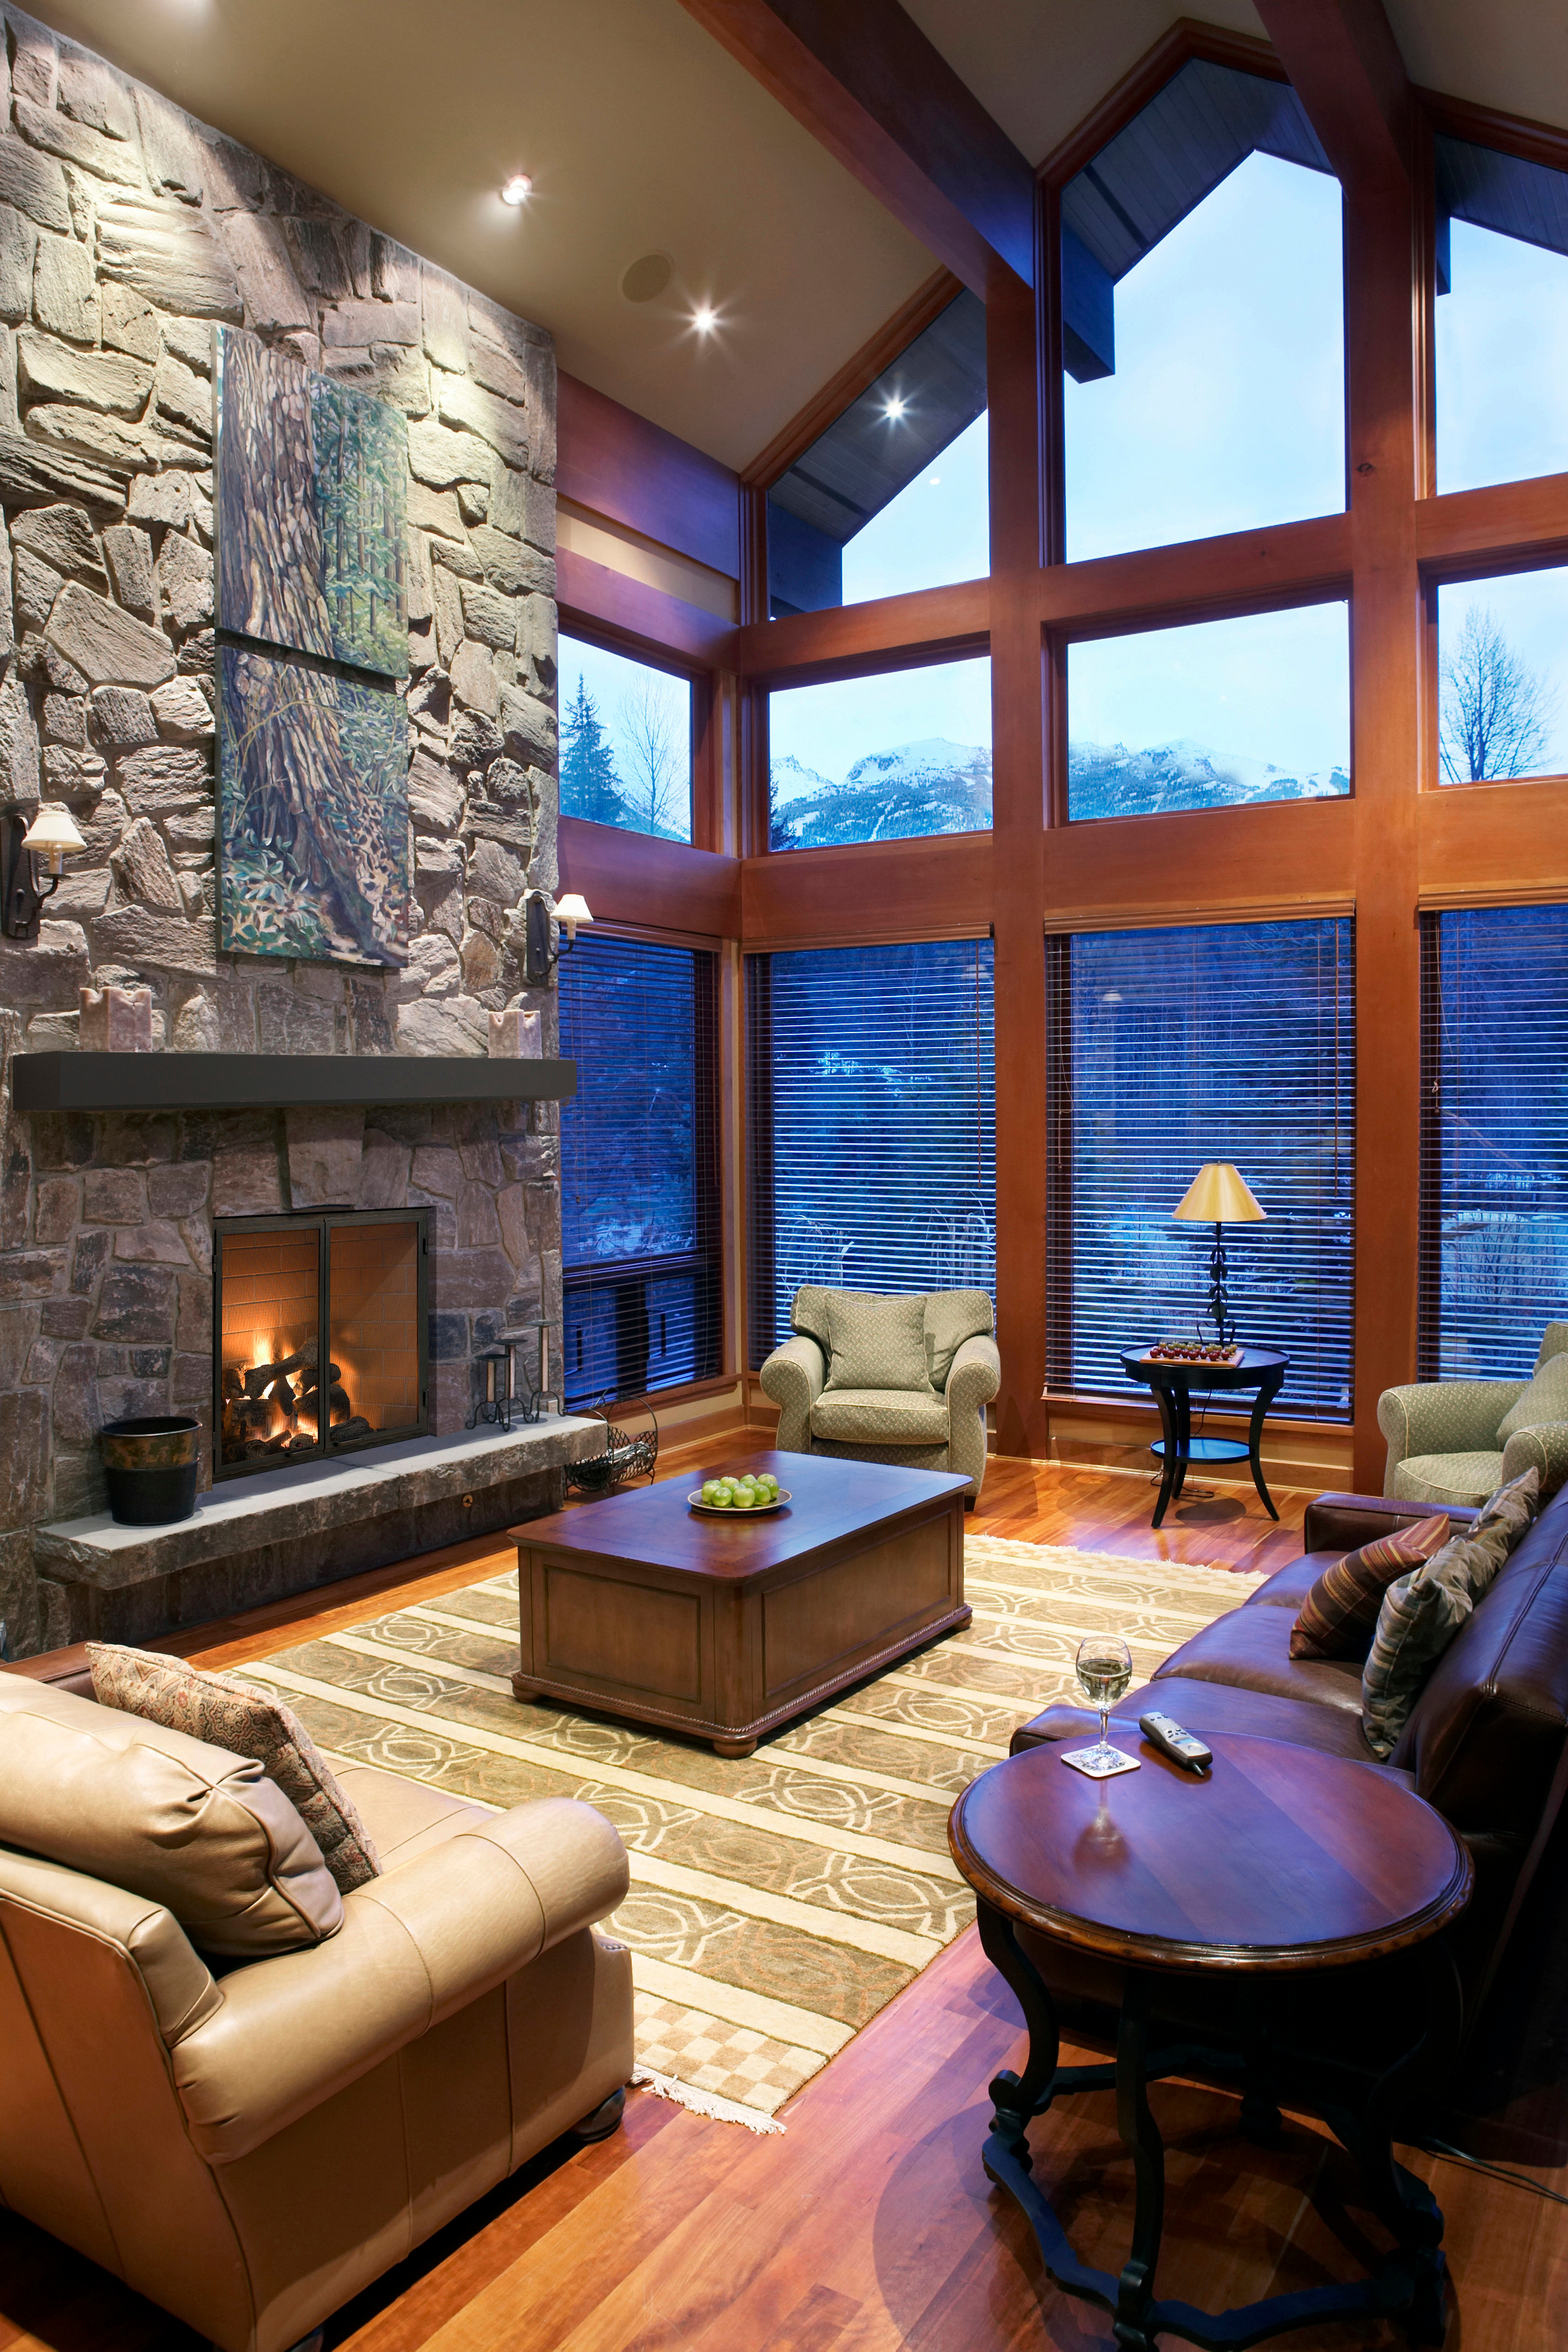 Fireside Hearth & Home image 4